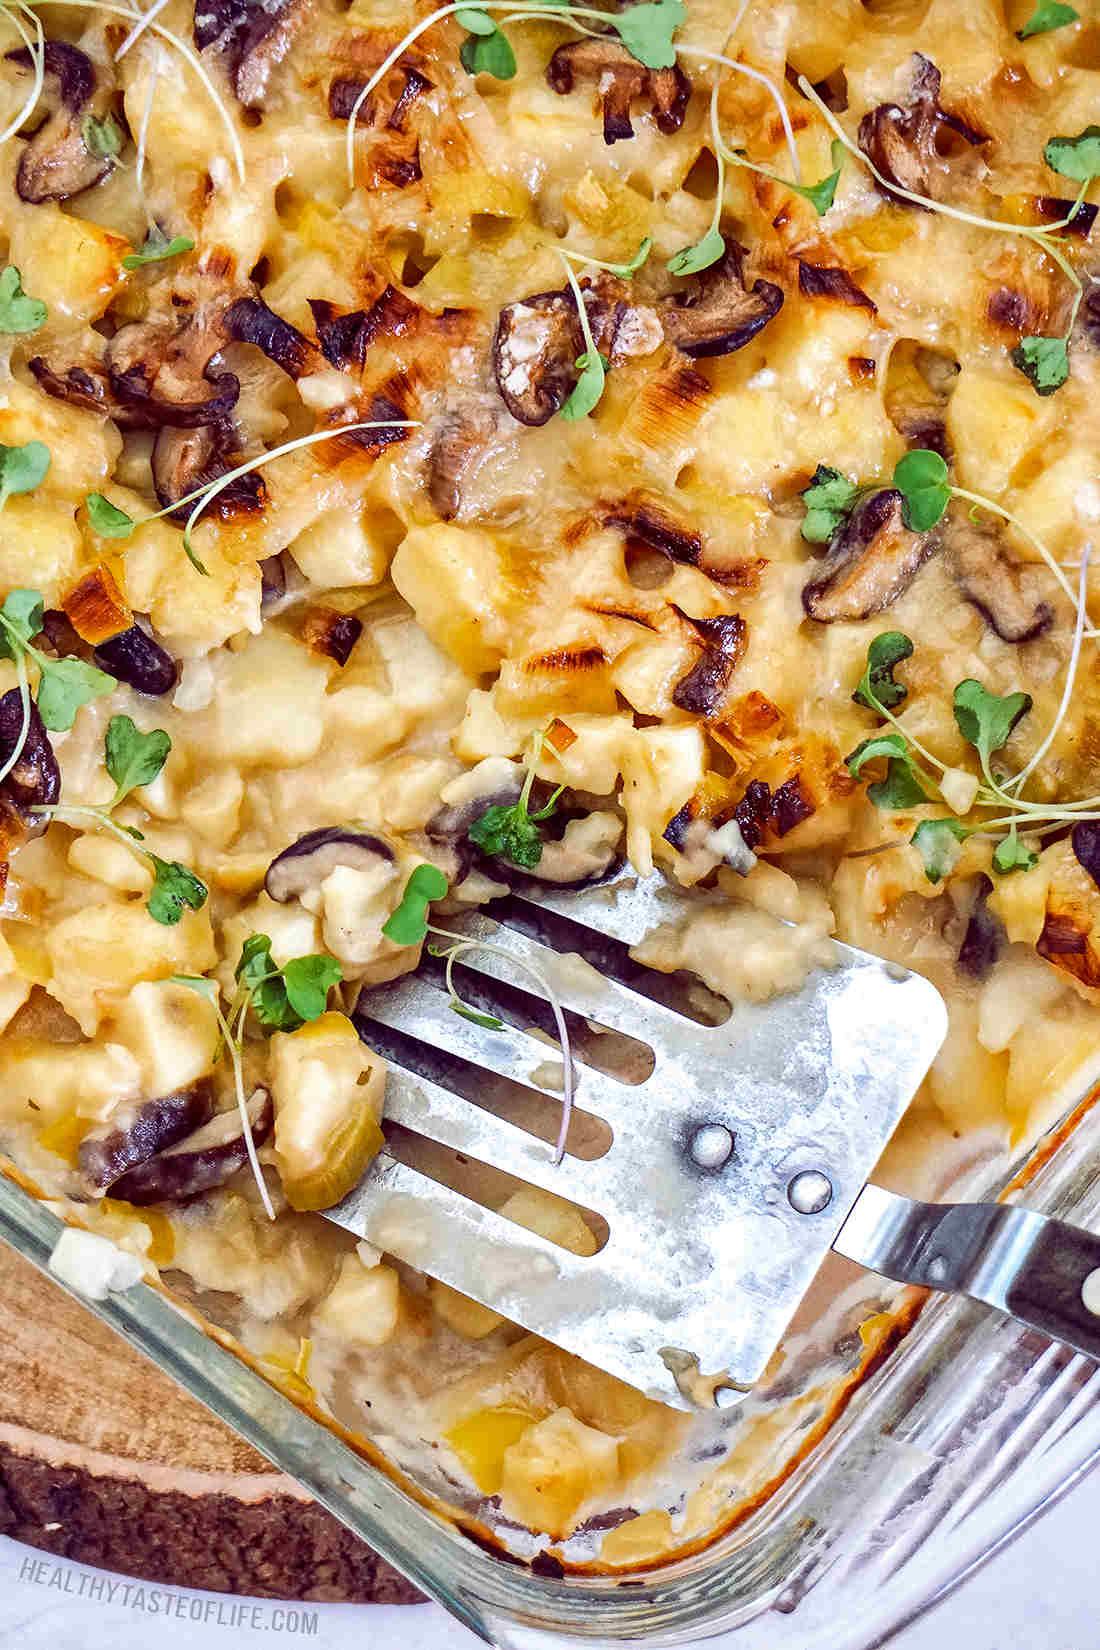 Vegan baked potato casserole (au gratin) #veganpotatobake (gluten free dairy free recipe)  #potato #casserole